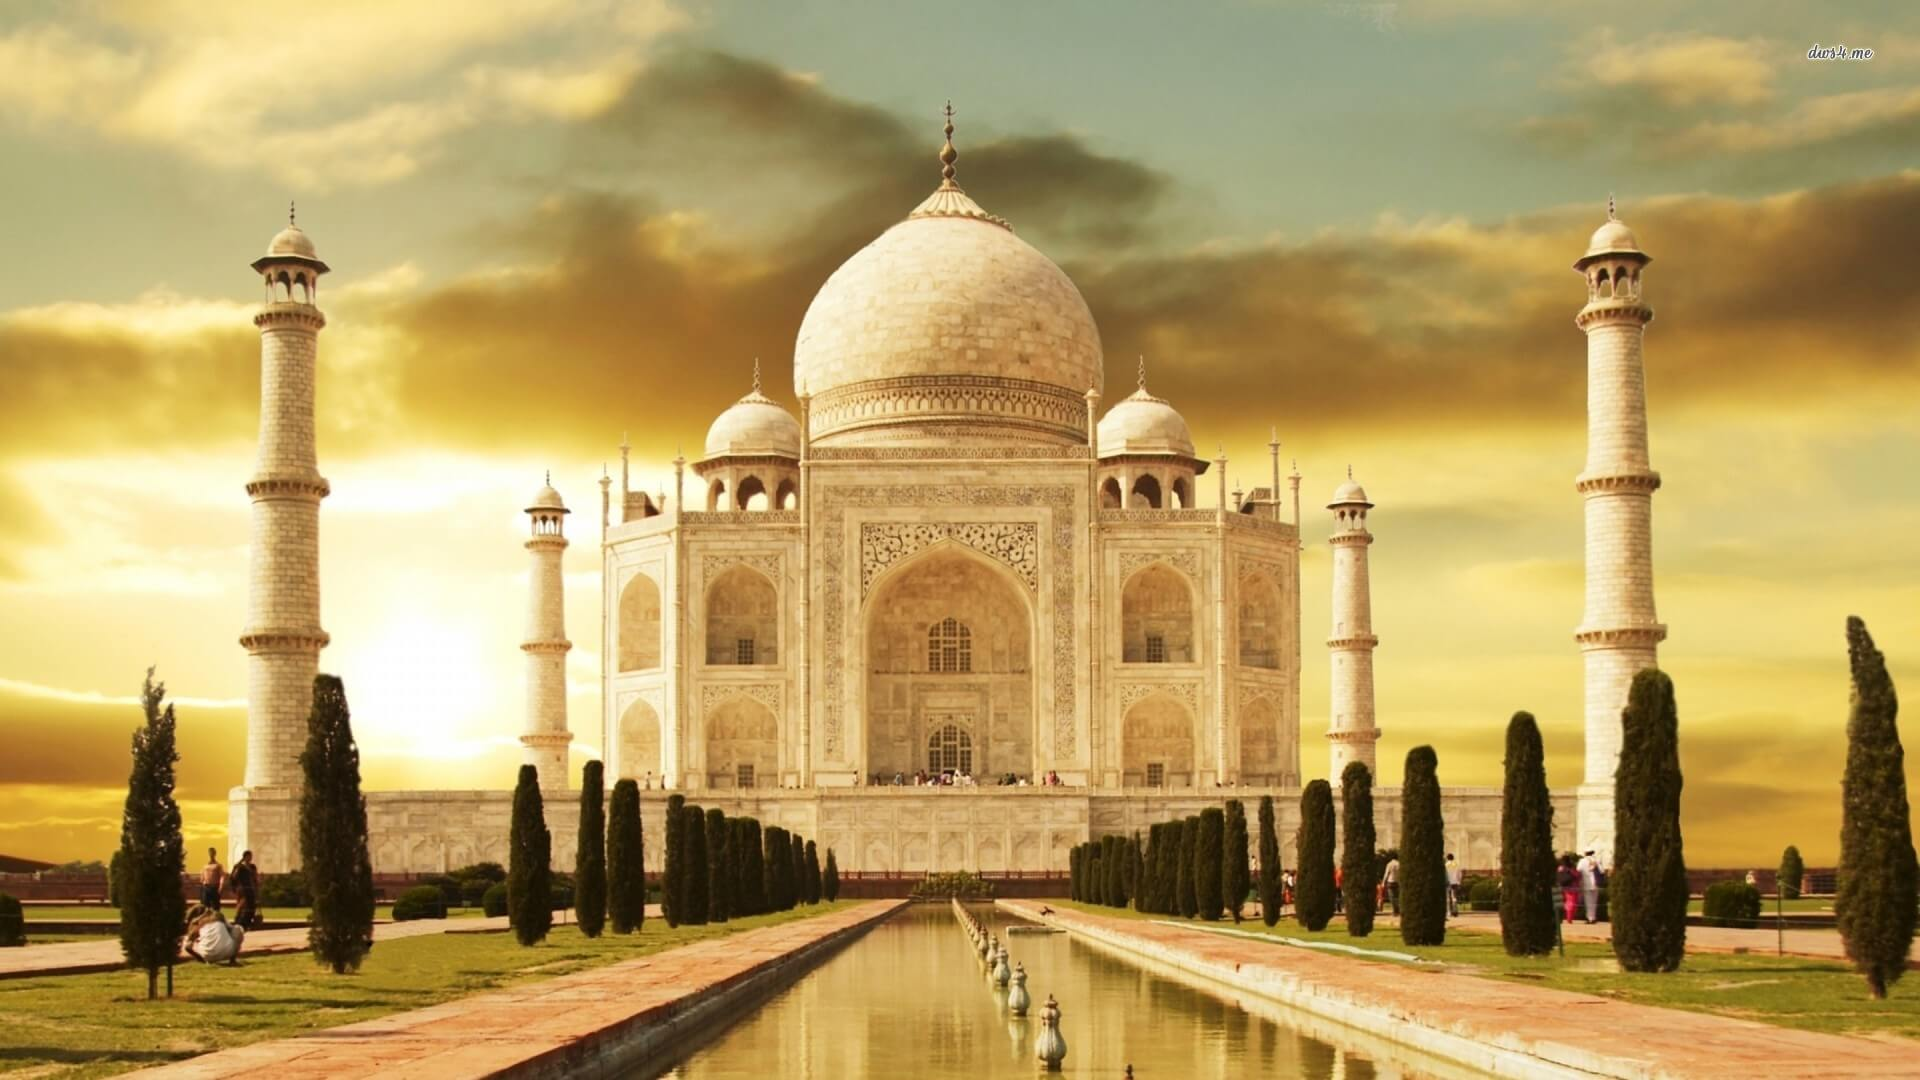 Facts of Taj Mahal